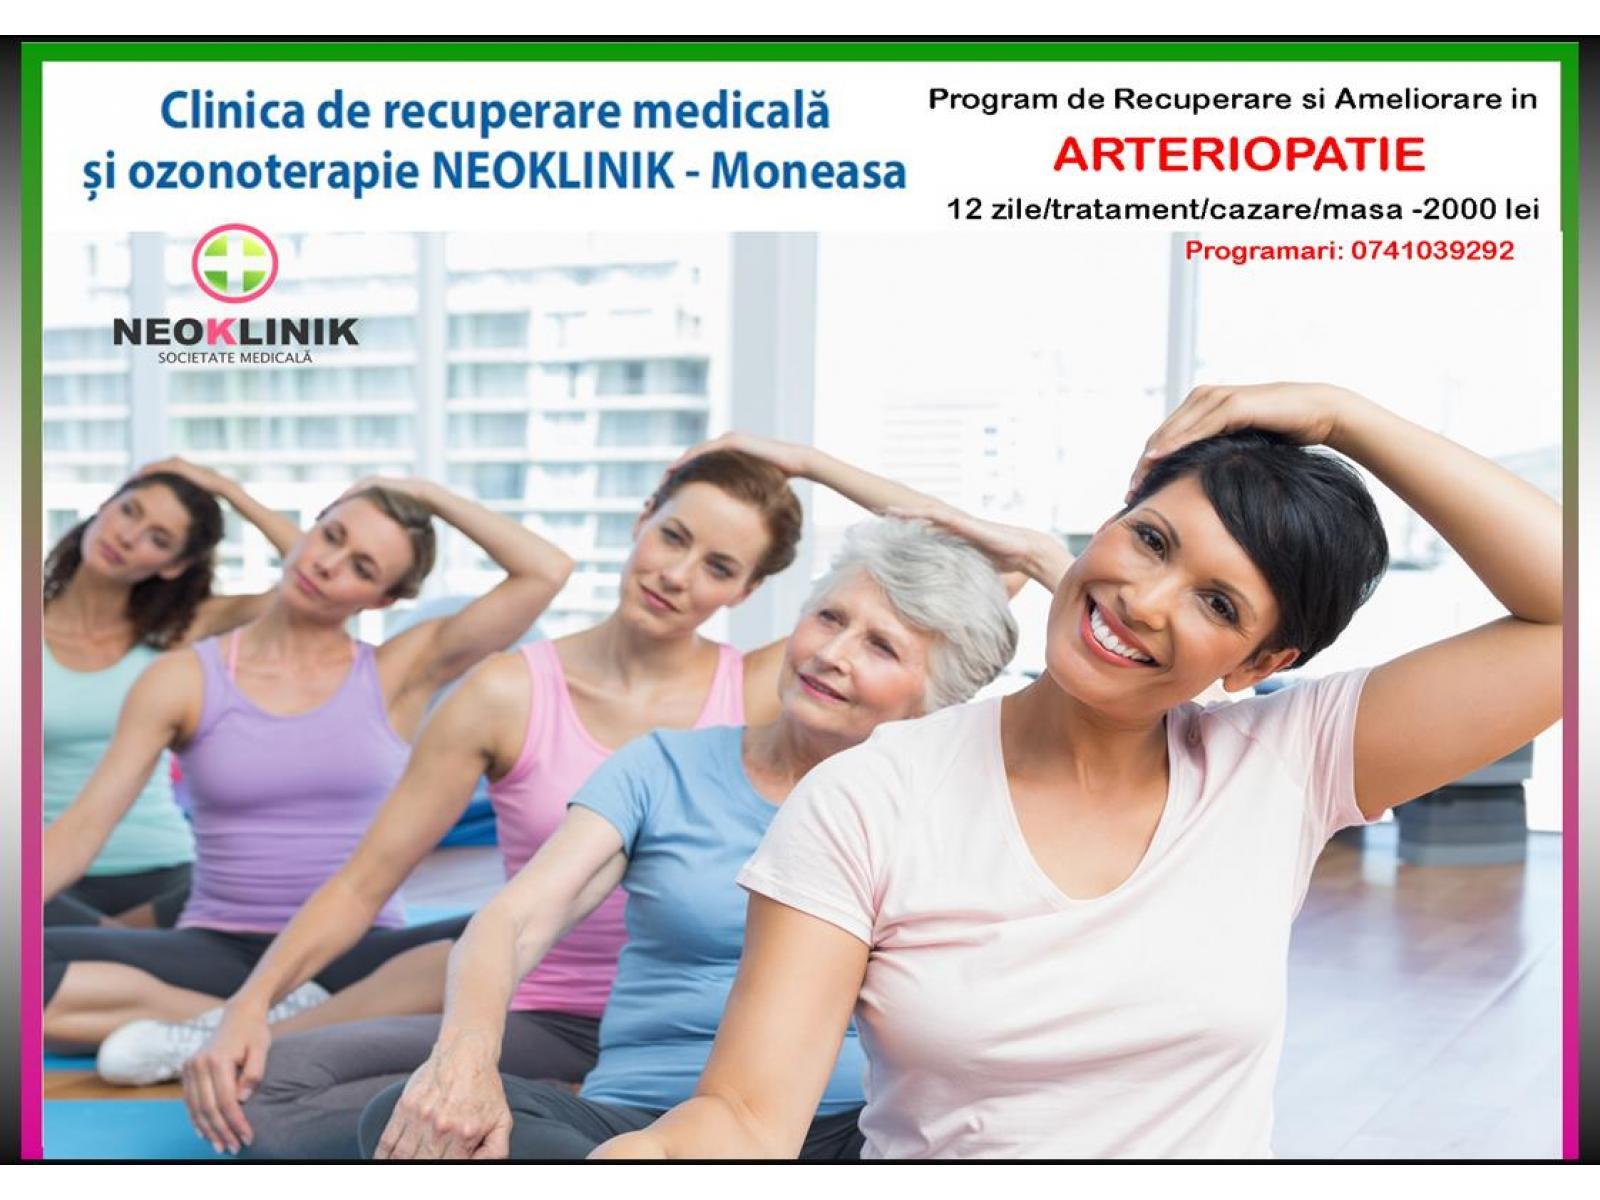 NeoKlinik - Arteriopatii.jpg